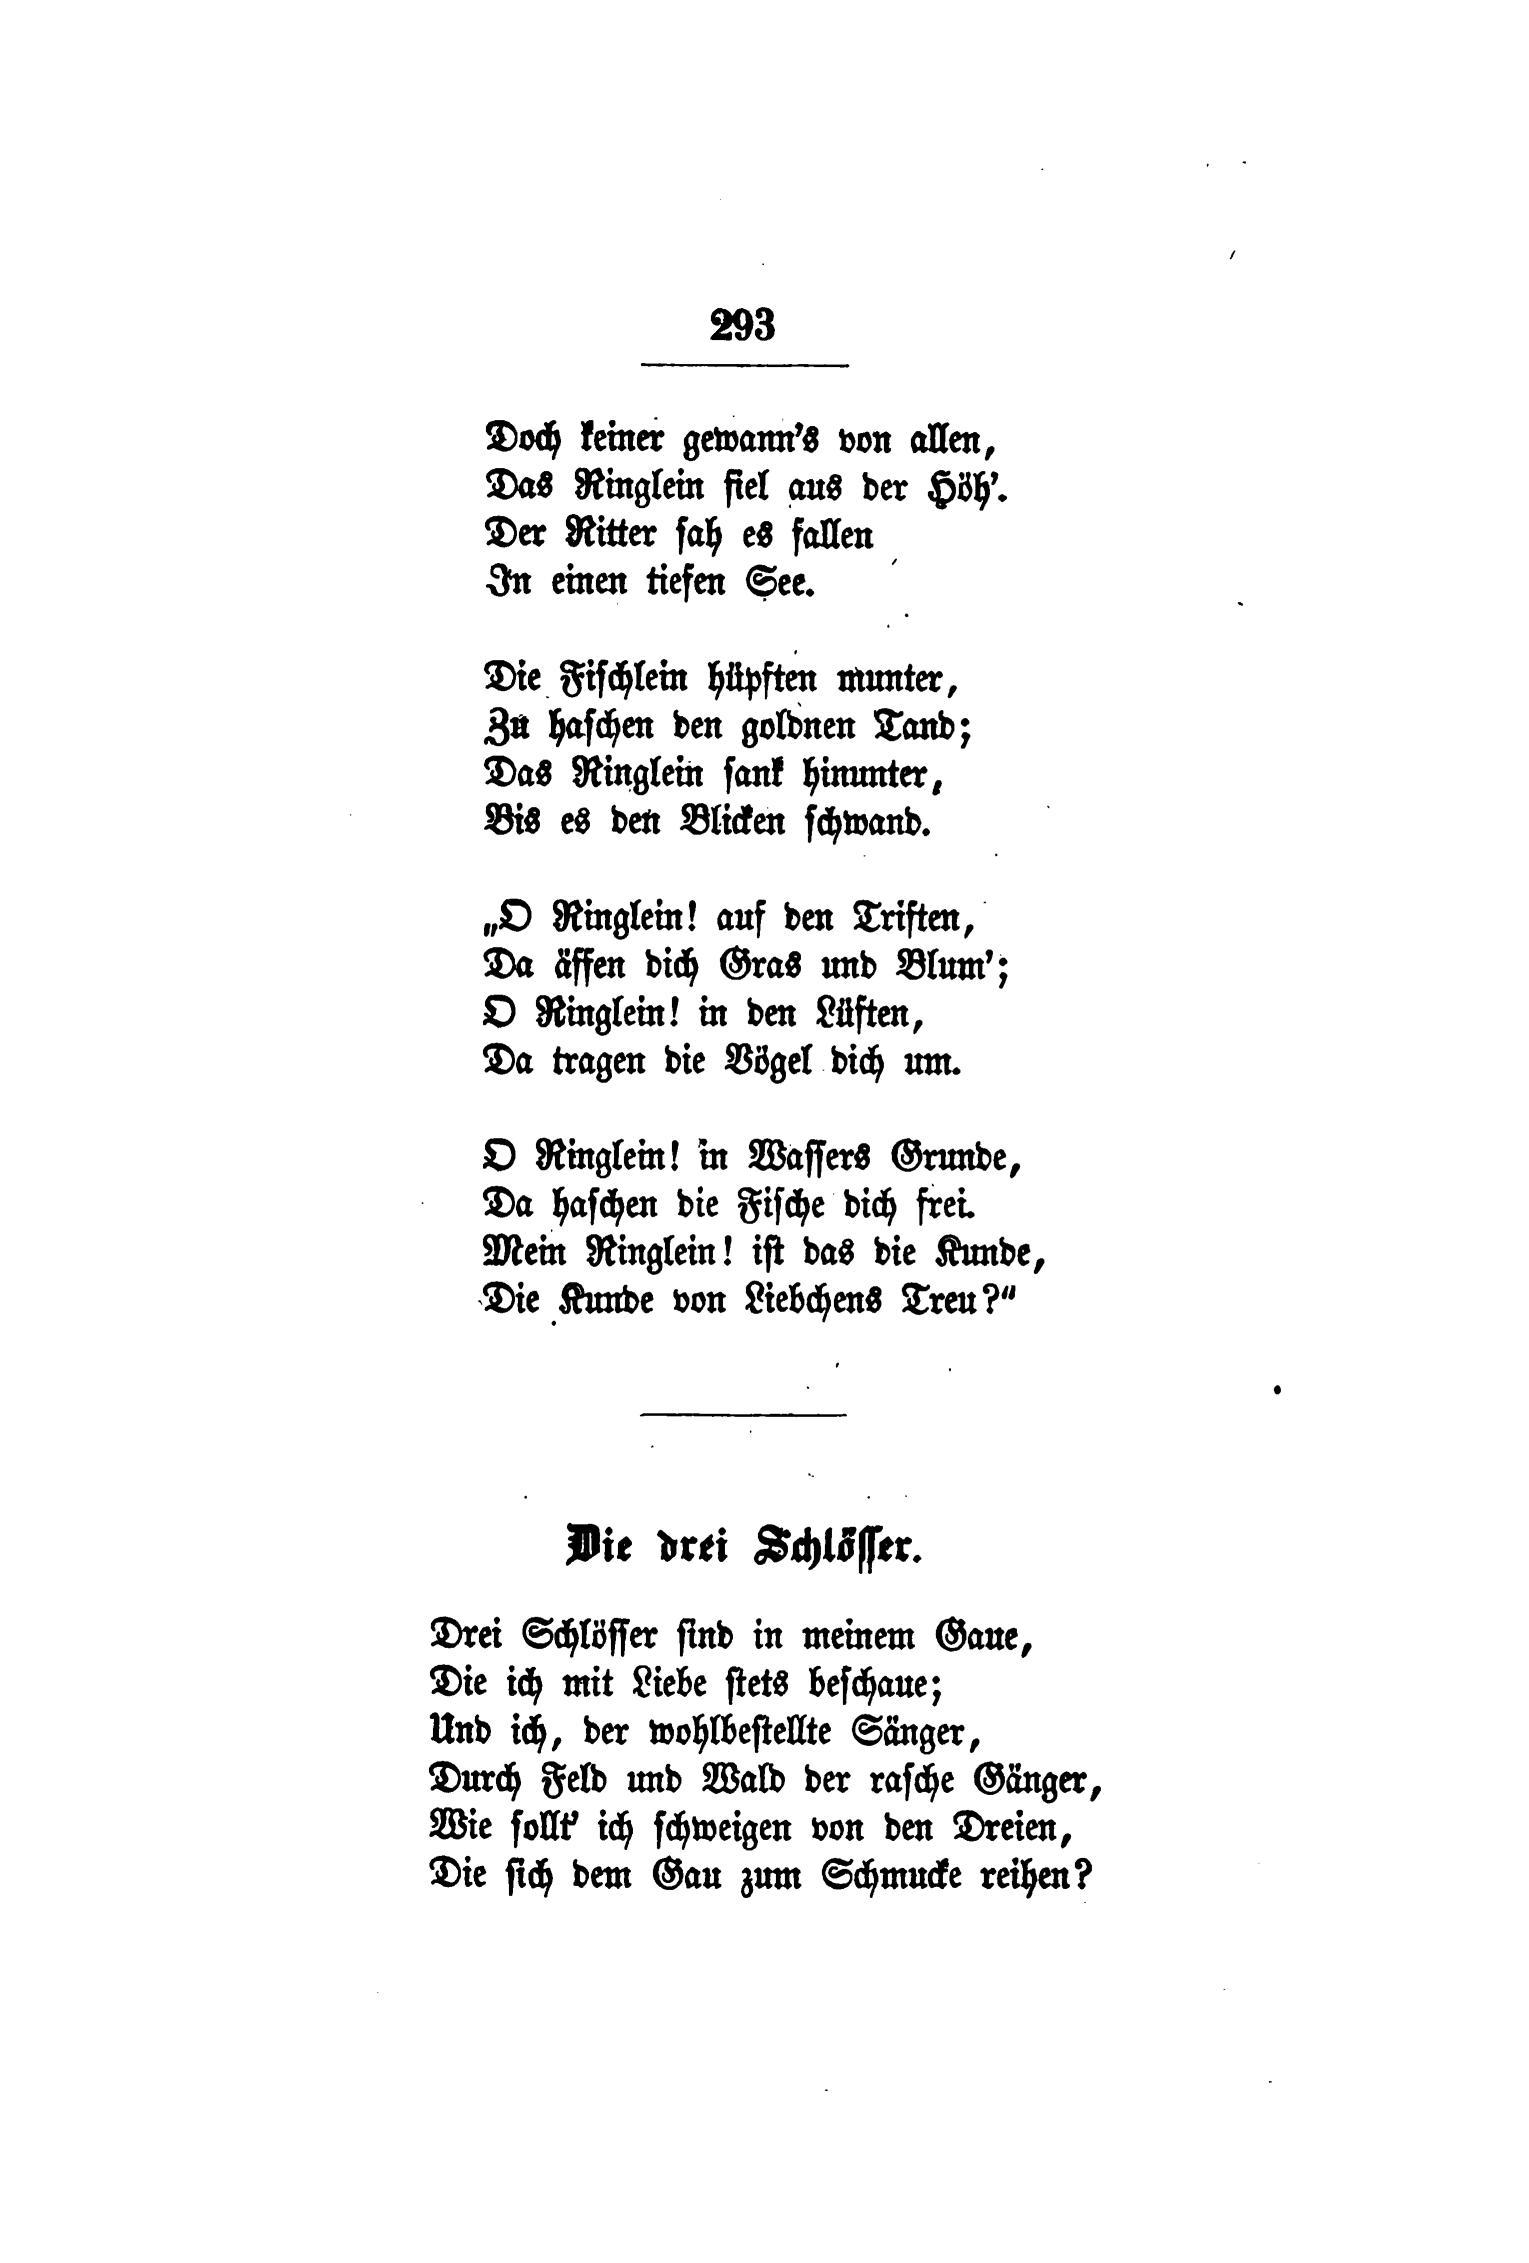 File:De Gedichte (Uhland) 311.jpg - Wikimedia Commons